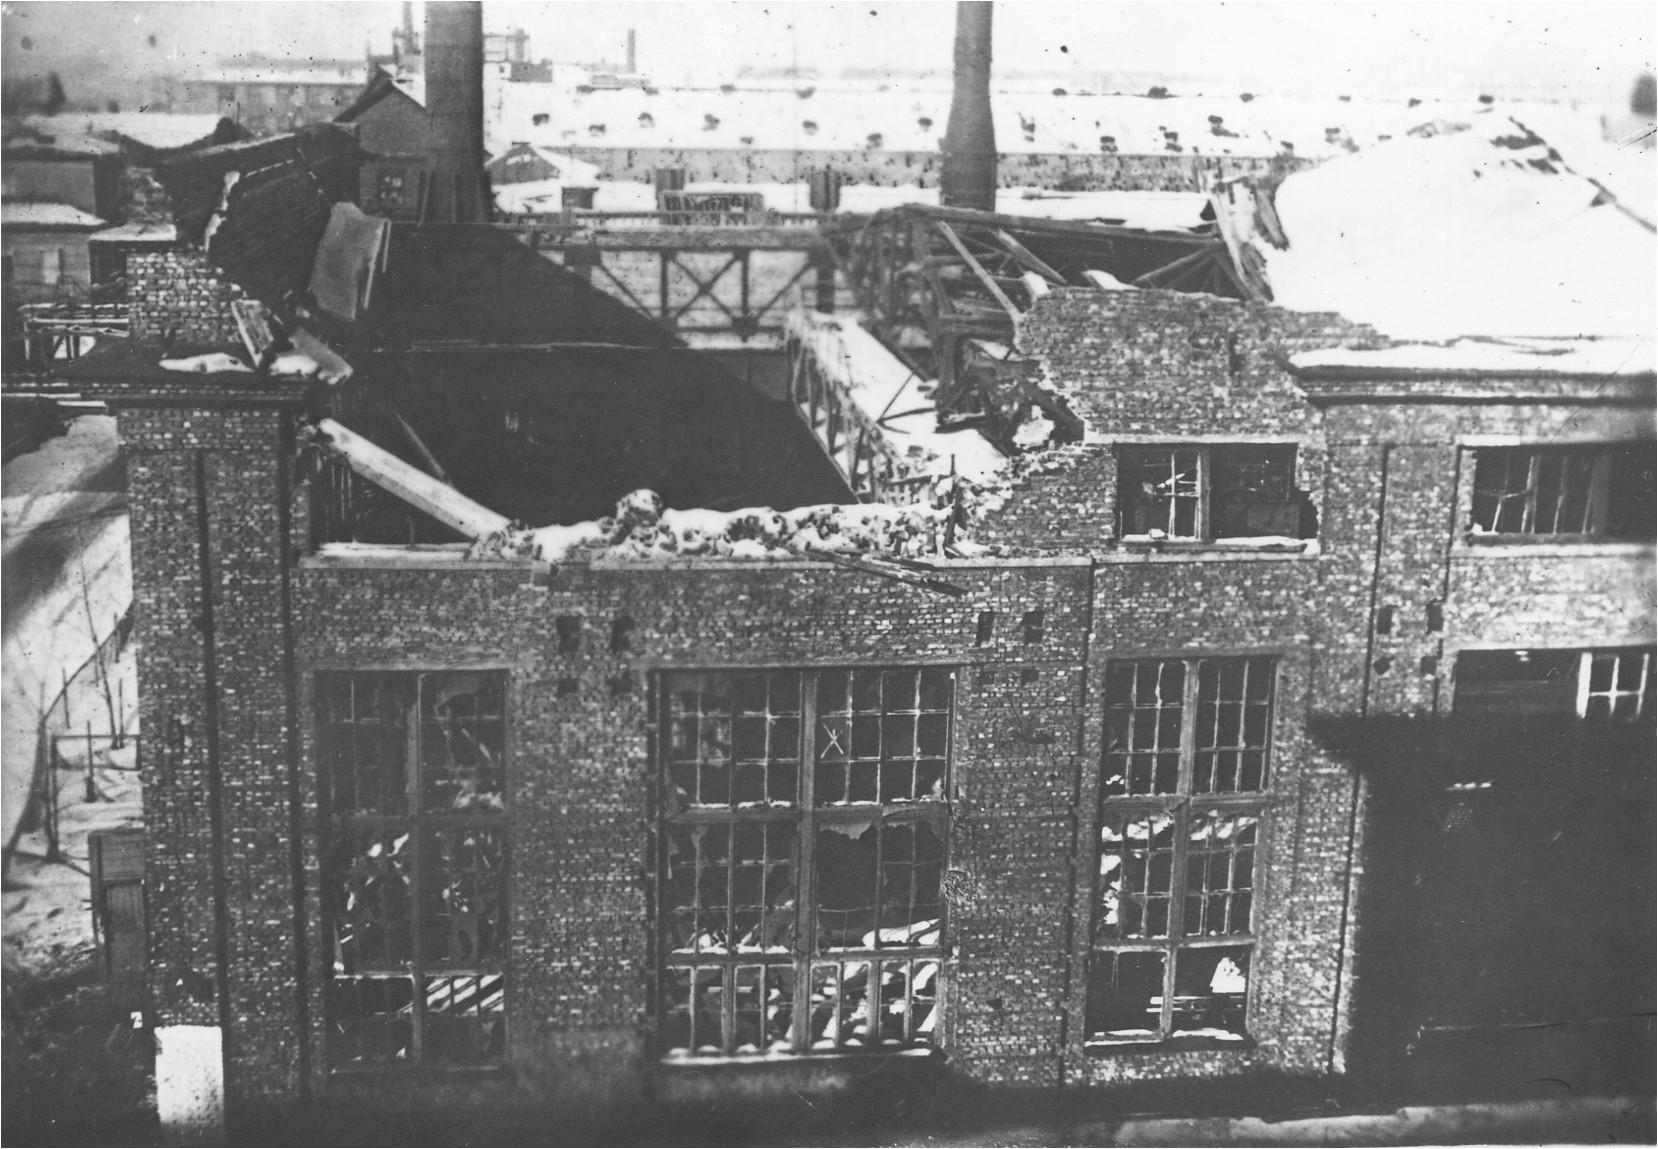 Сборочный цех после бомбежки. 1942 г.